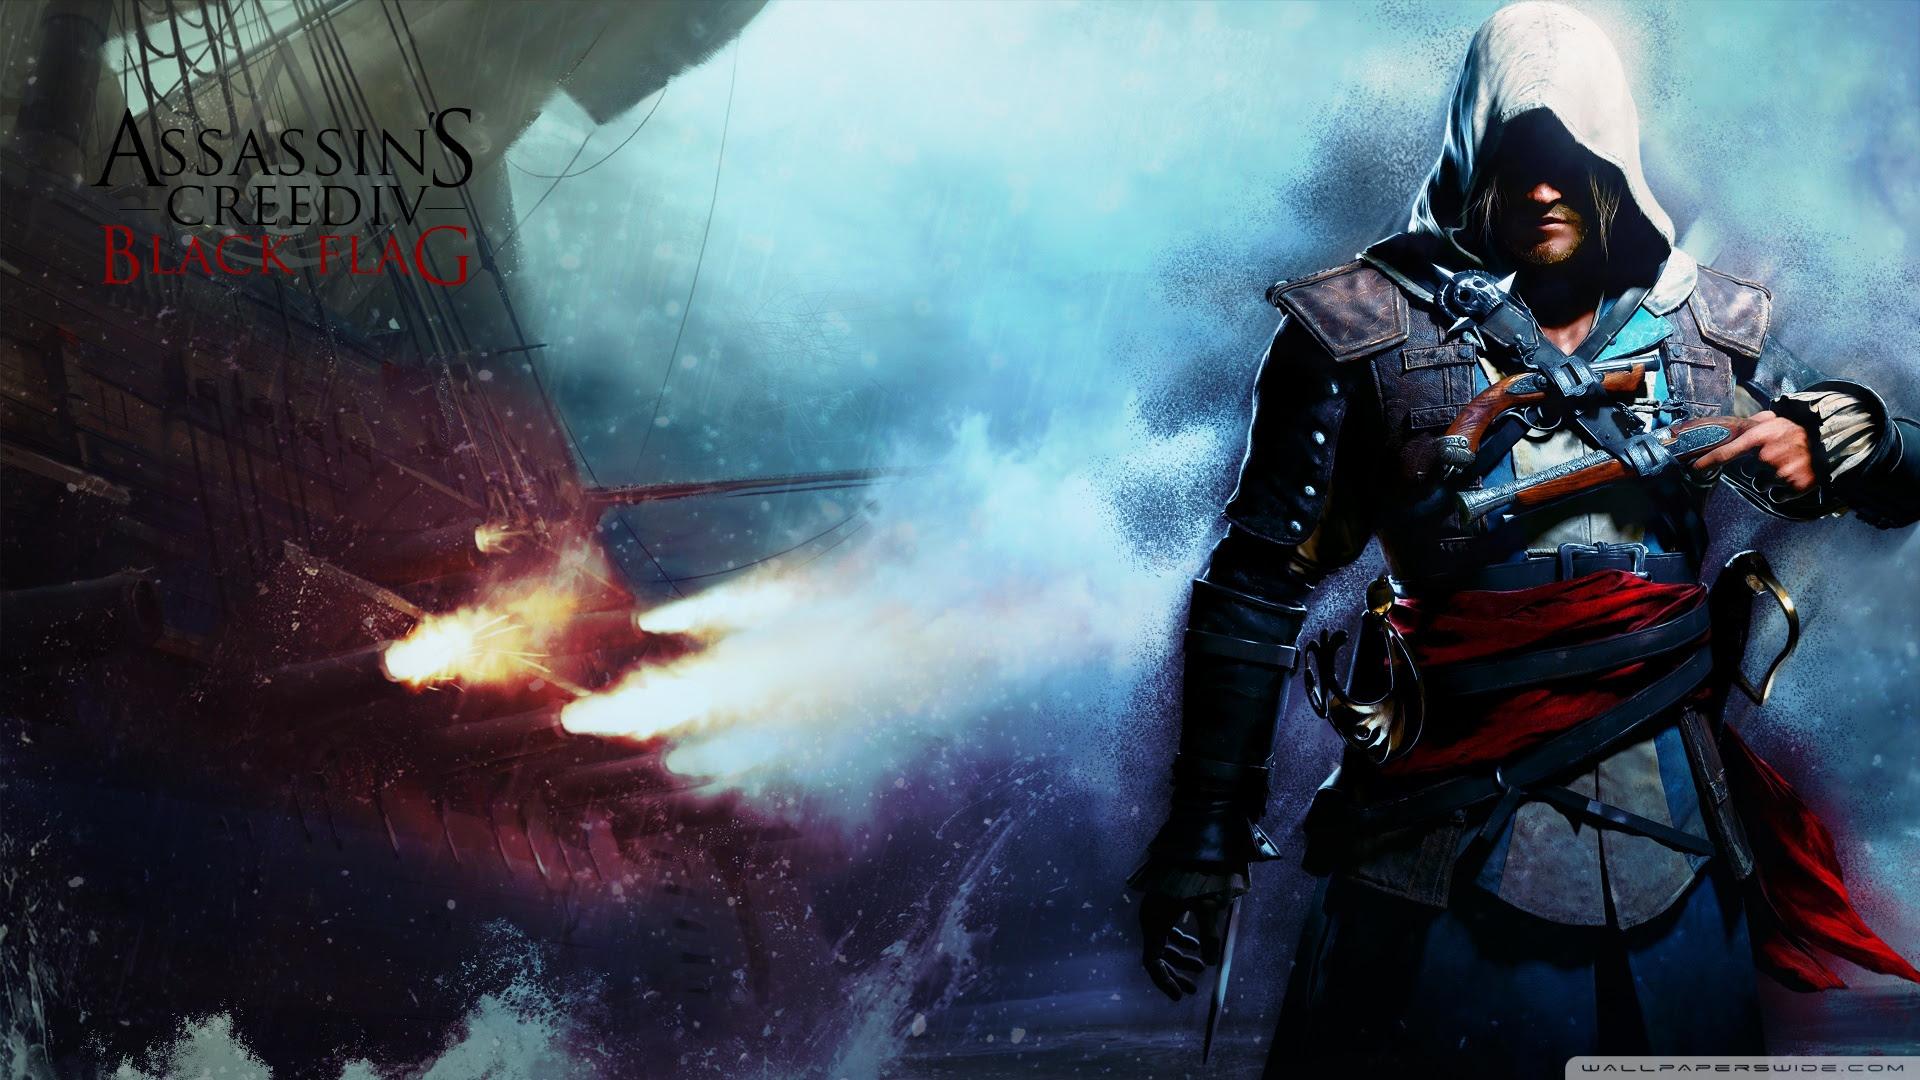 Assassin Creed Iv Black Flag Wallpaper Ultra Hd Desktop Background